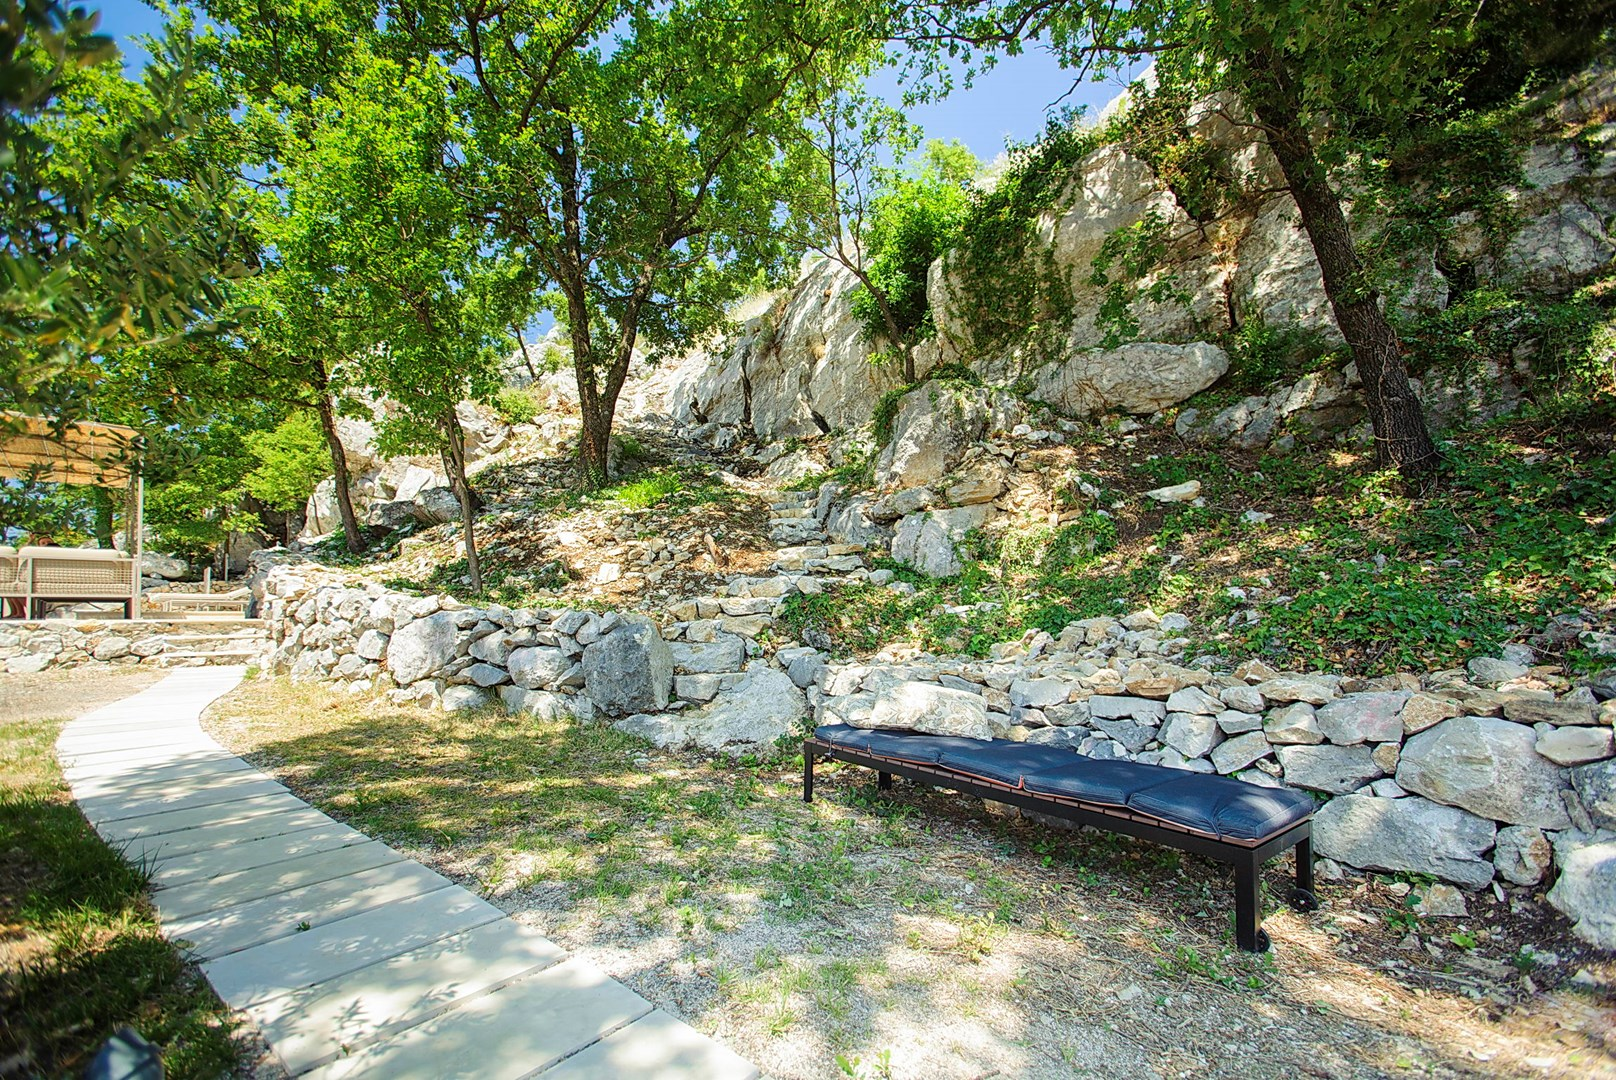 Ferienhaus  (2474393), Kostanje, , Dalmatien, Kroatien, Bild 43